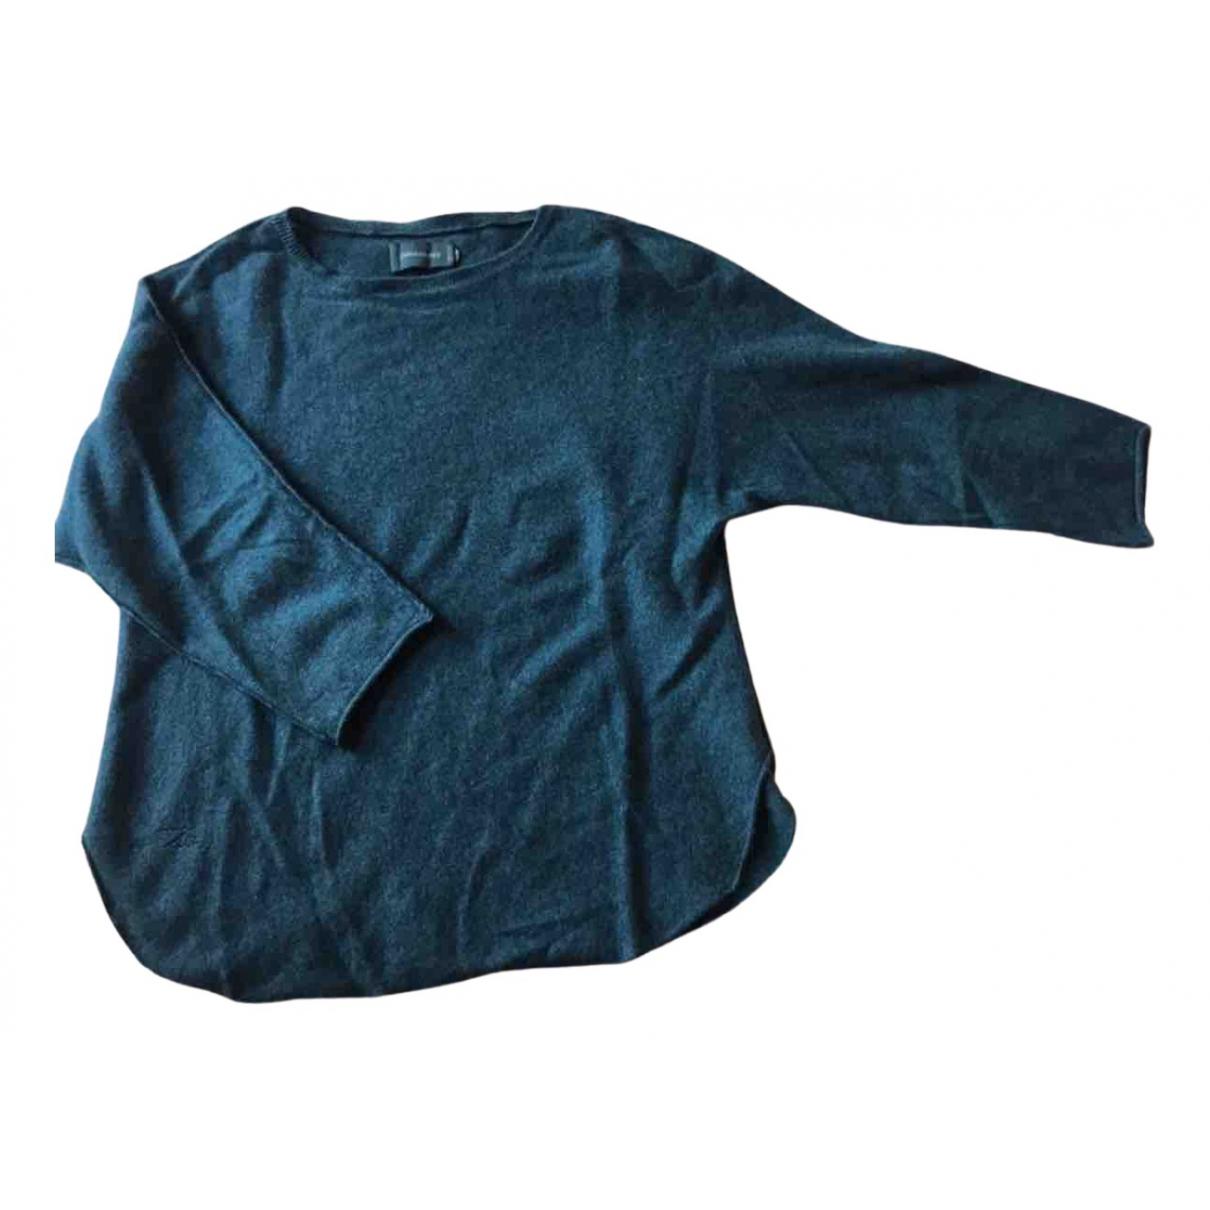 Zadig & Voltaire N Blue Cashmere Knitwear for Women M International